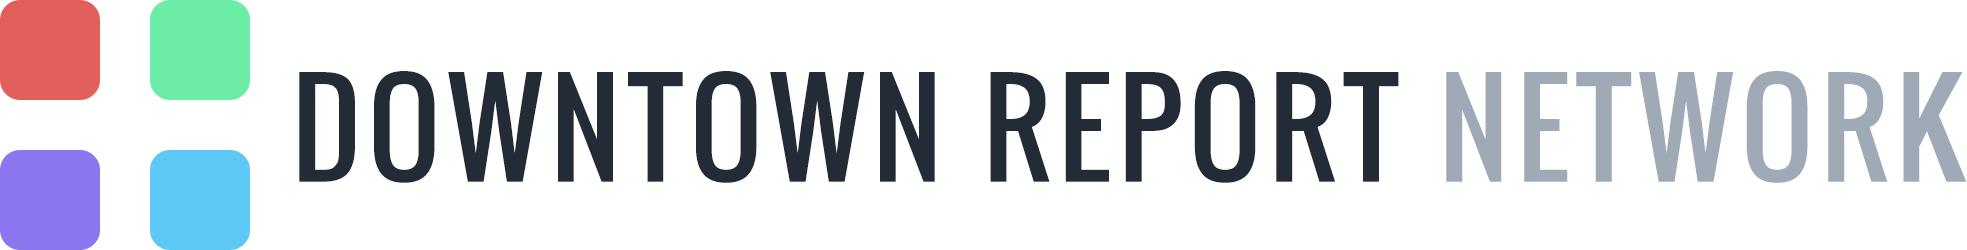 DowntownReport Network